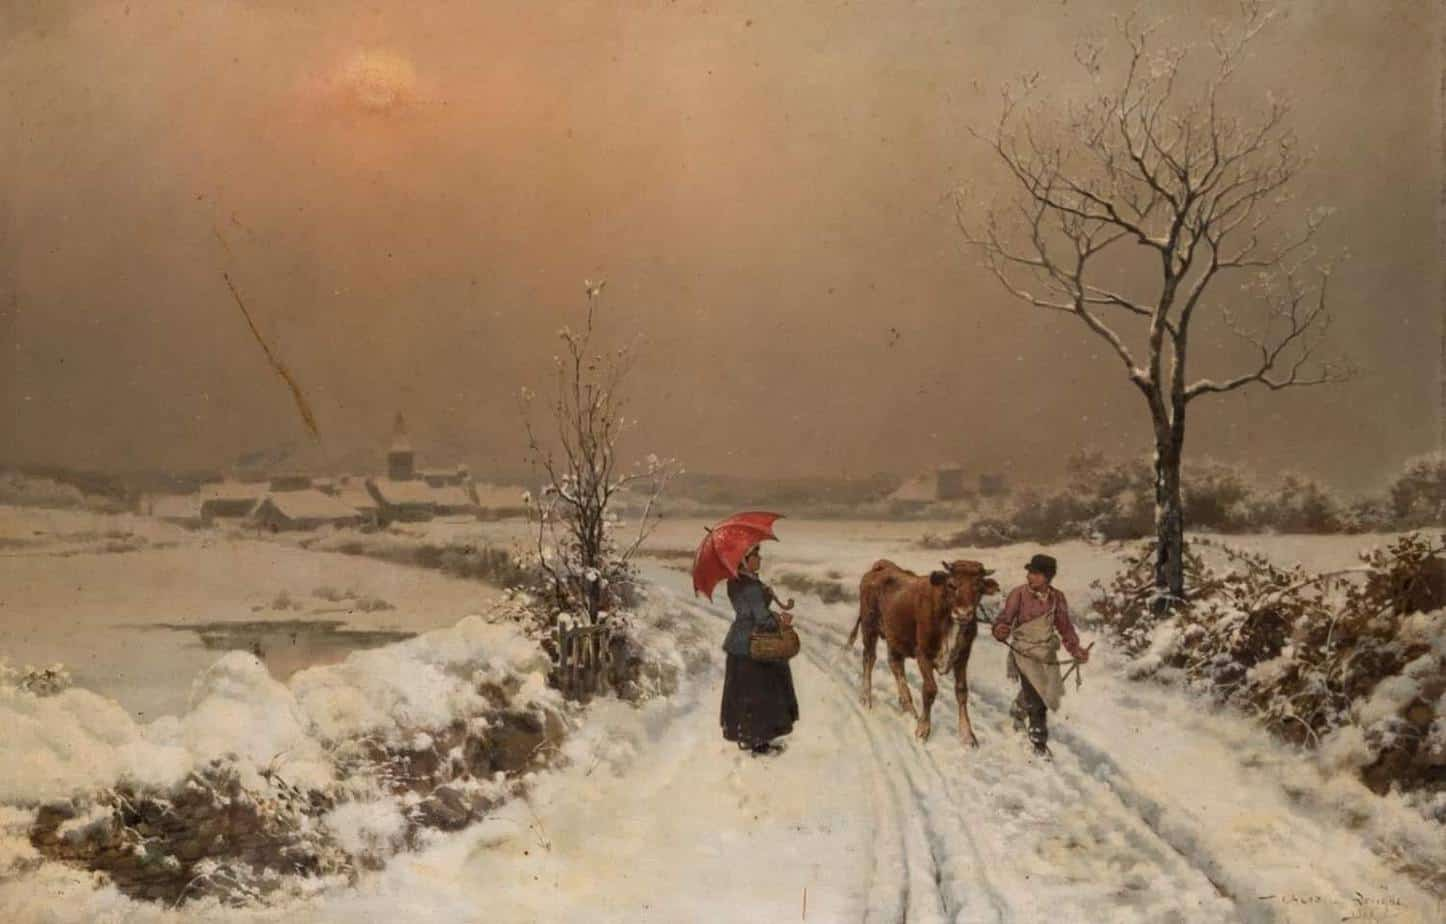 Theodore Levigne (1848 - 1912)